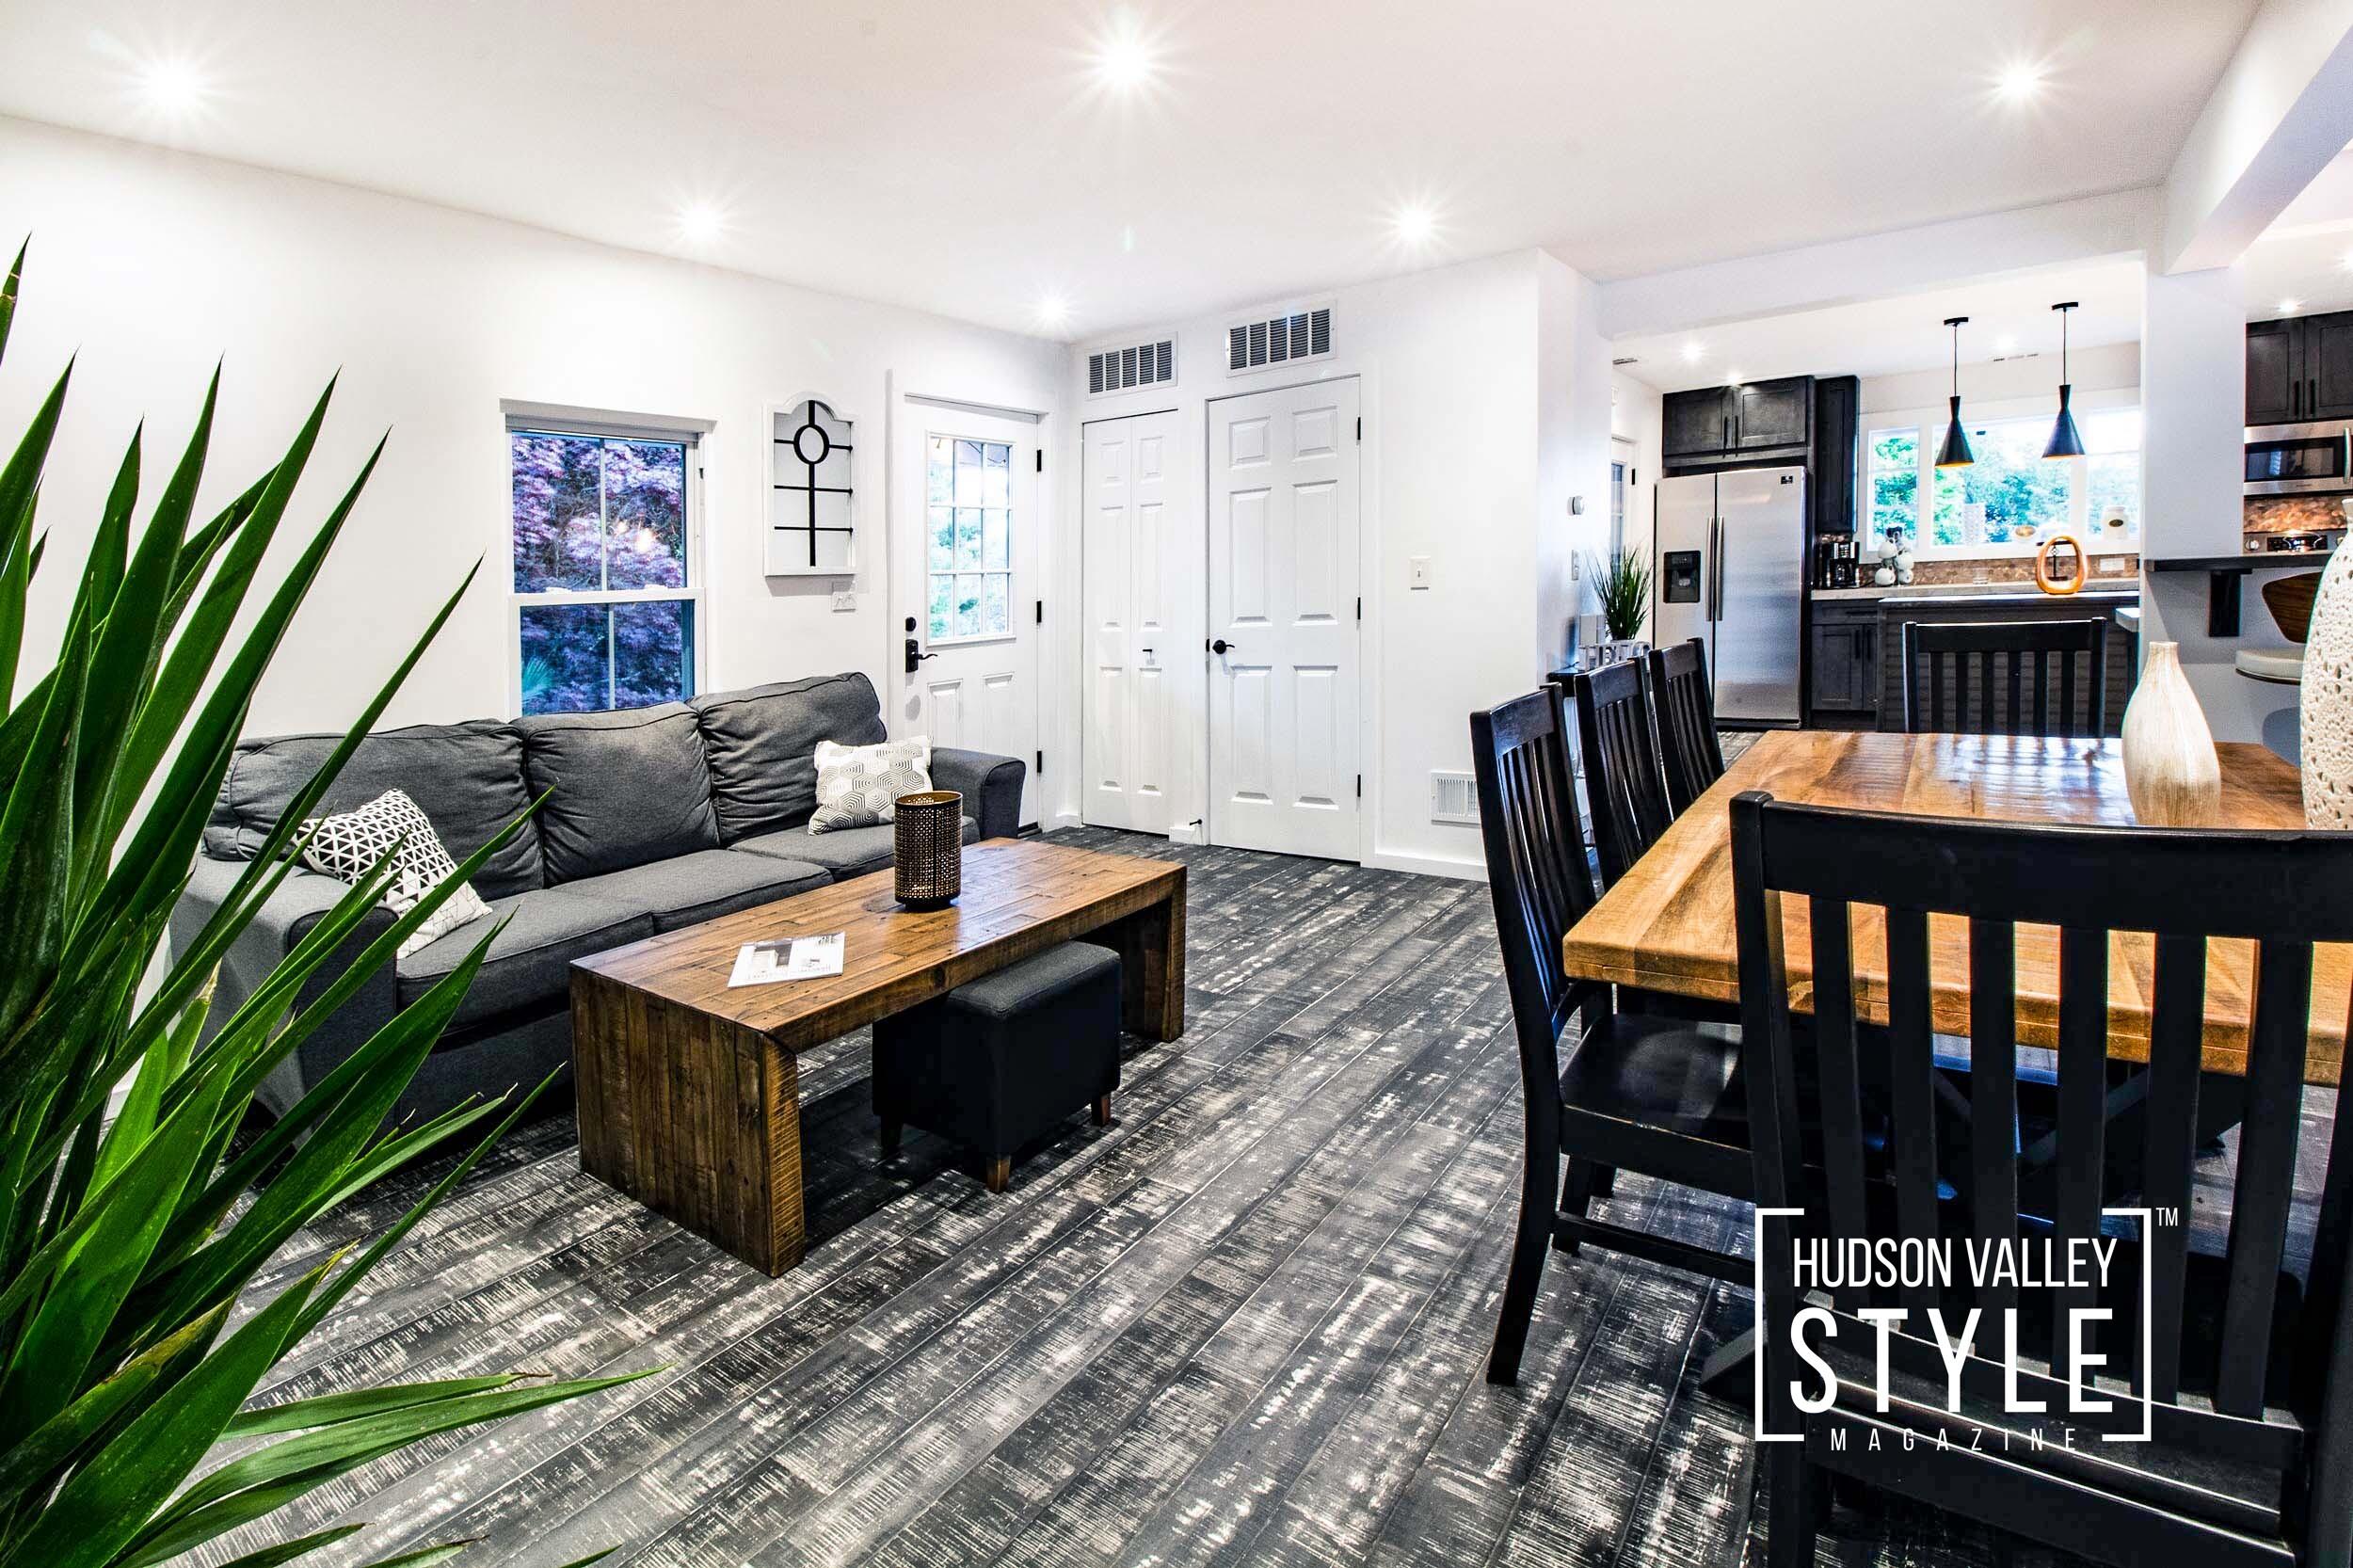 How to Design a Modern Farmhouse – Interior Design Tips by Designer Maxwell Alexander – Photography and Featured Farmhouse Interior Design Project by Duncan Avenue Studios, New York